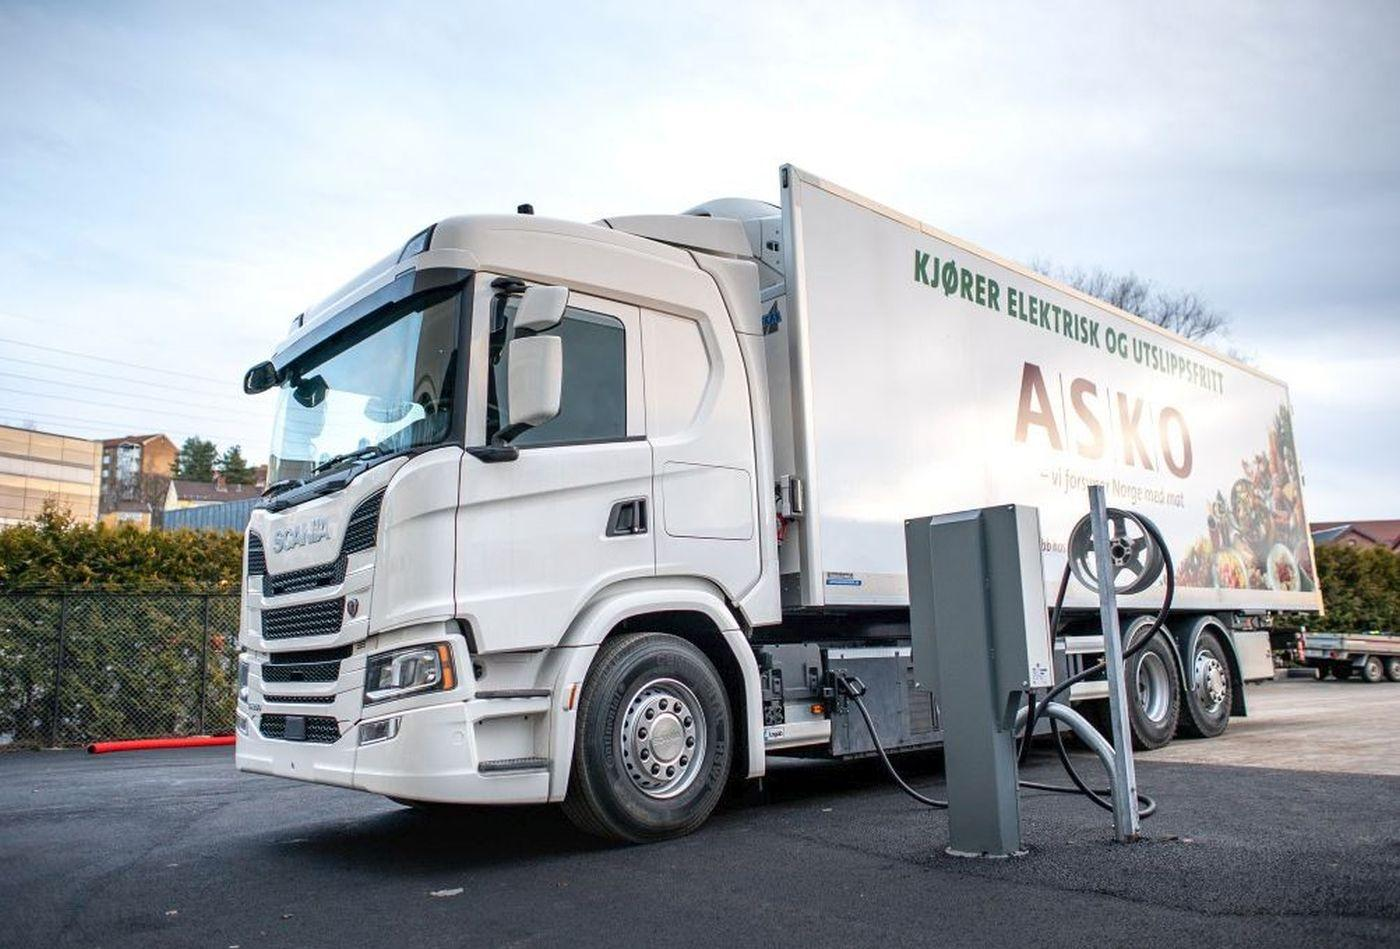 Scania Asko